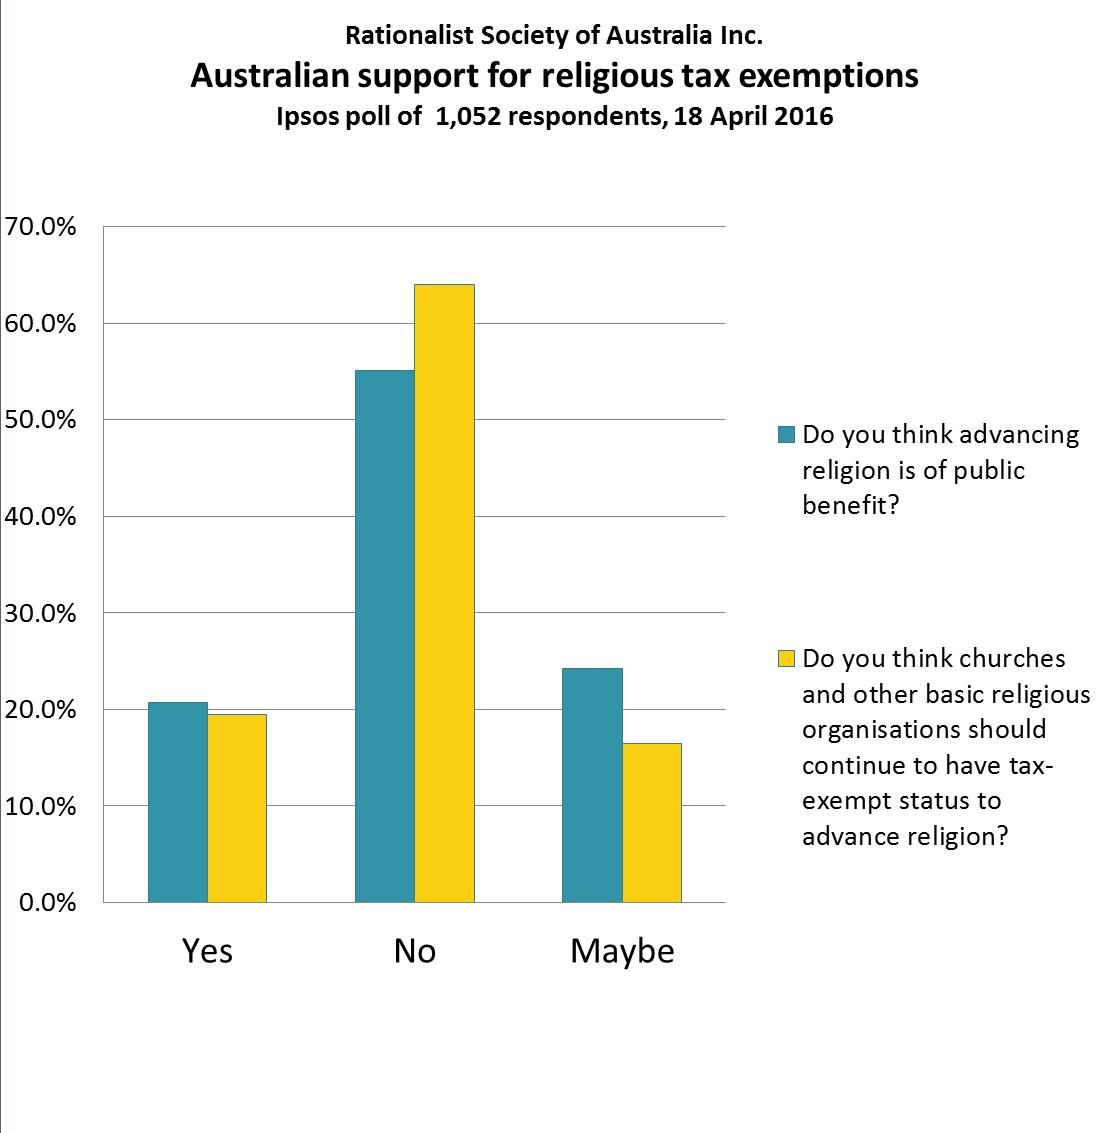 Ipsos Poll On Religious Tax Exemptions